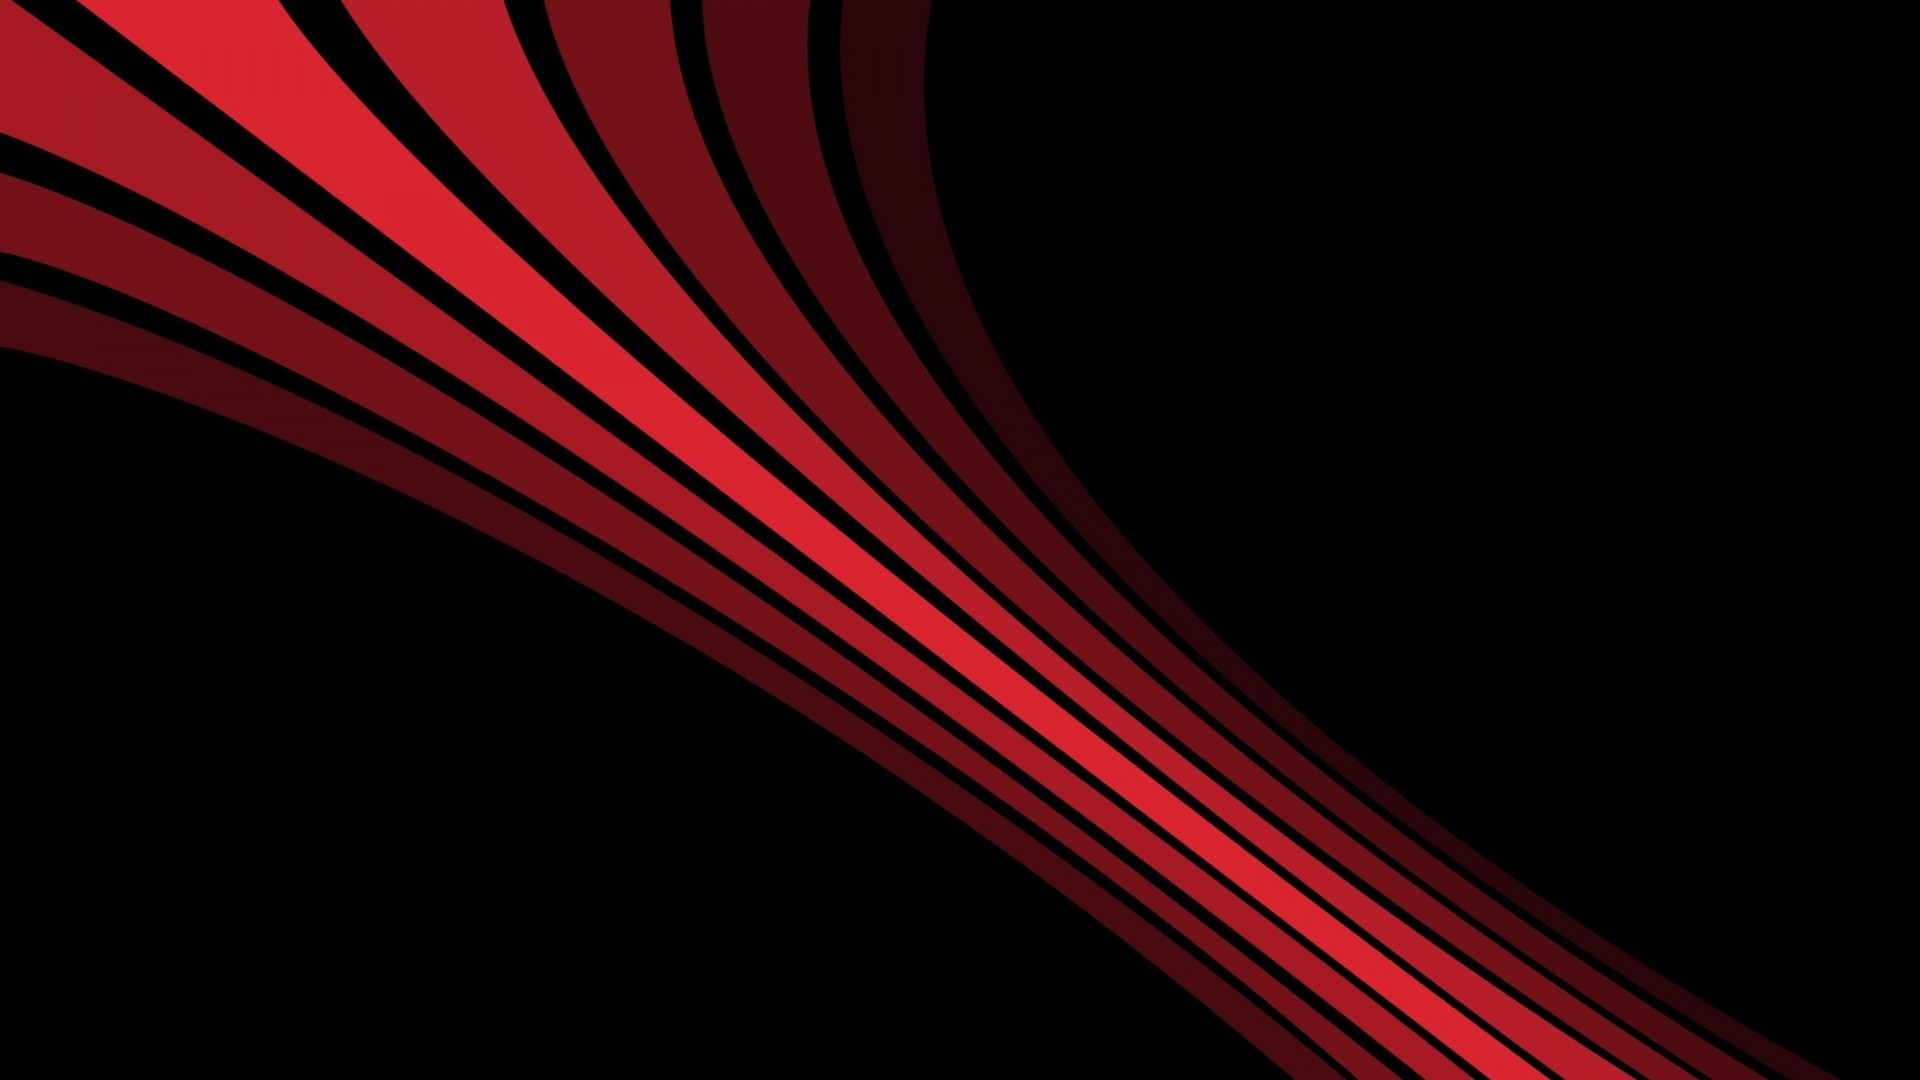 Wallpaper line, shadow, stripes, shape, black, red